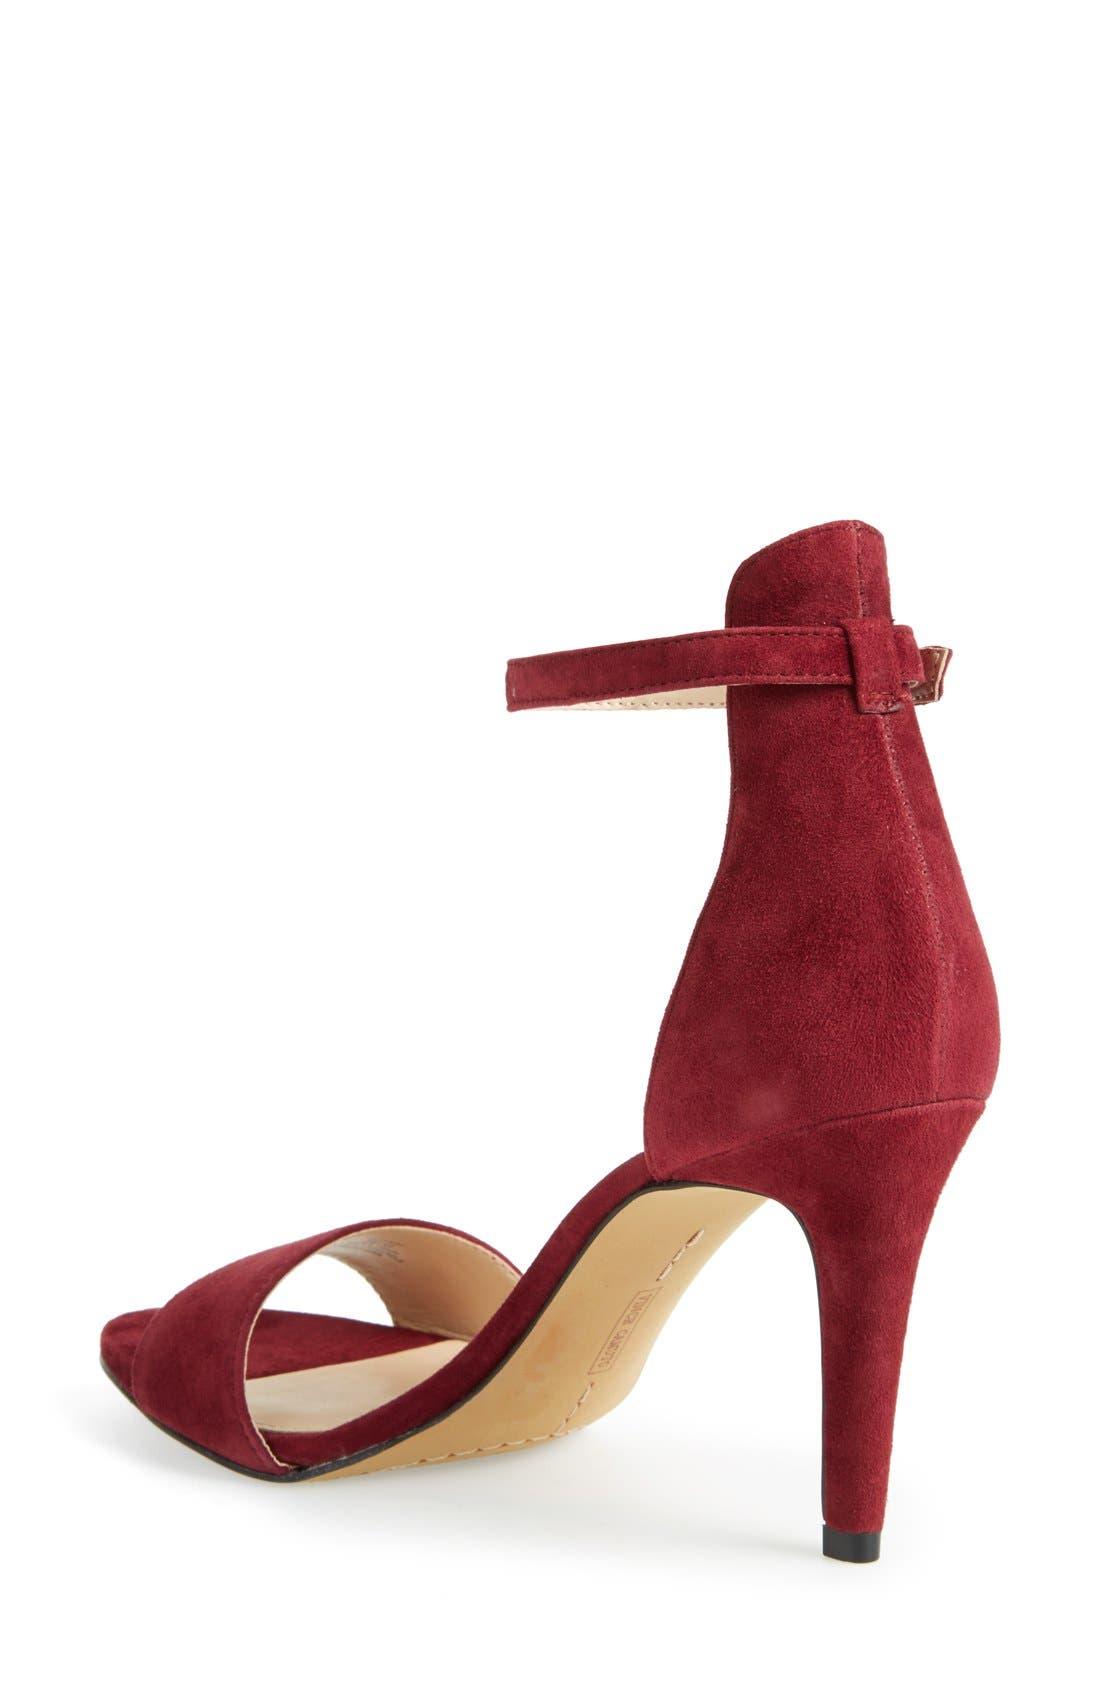 ,                             'Court' Ankle Strap Sandal,                             Alternate thumbnail 80, color,                             601